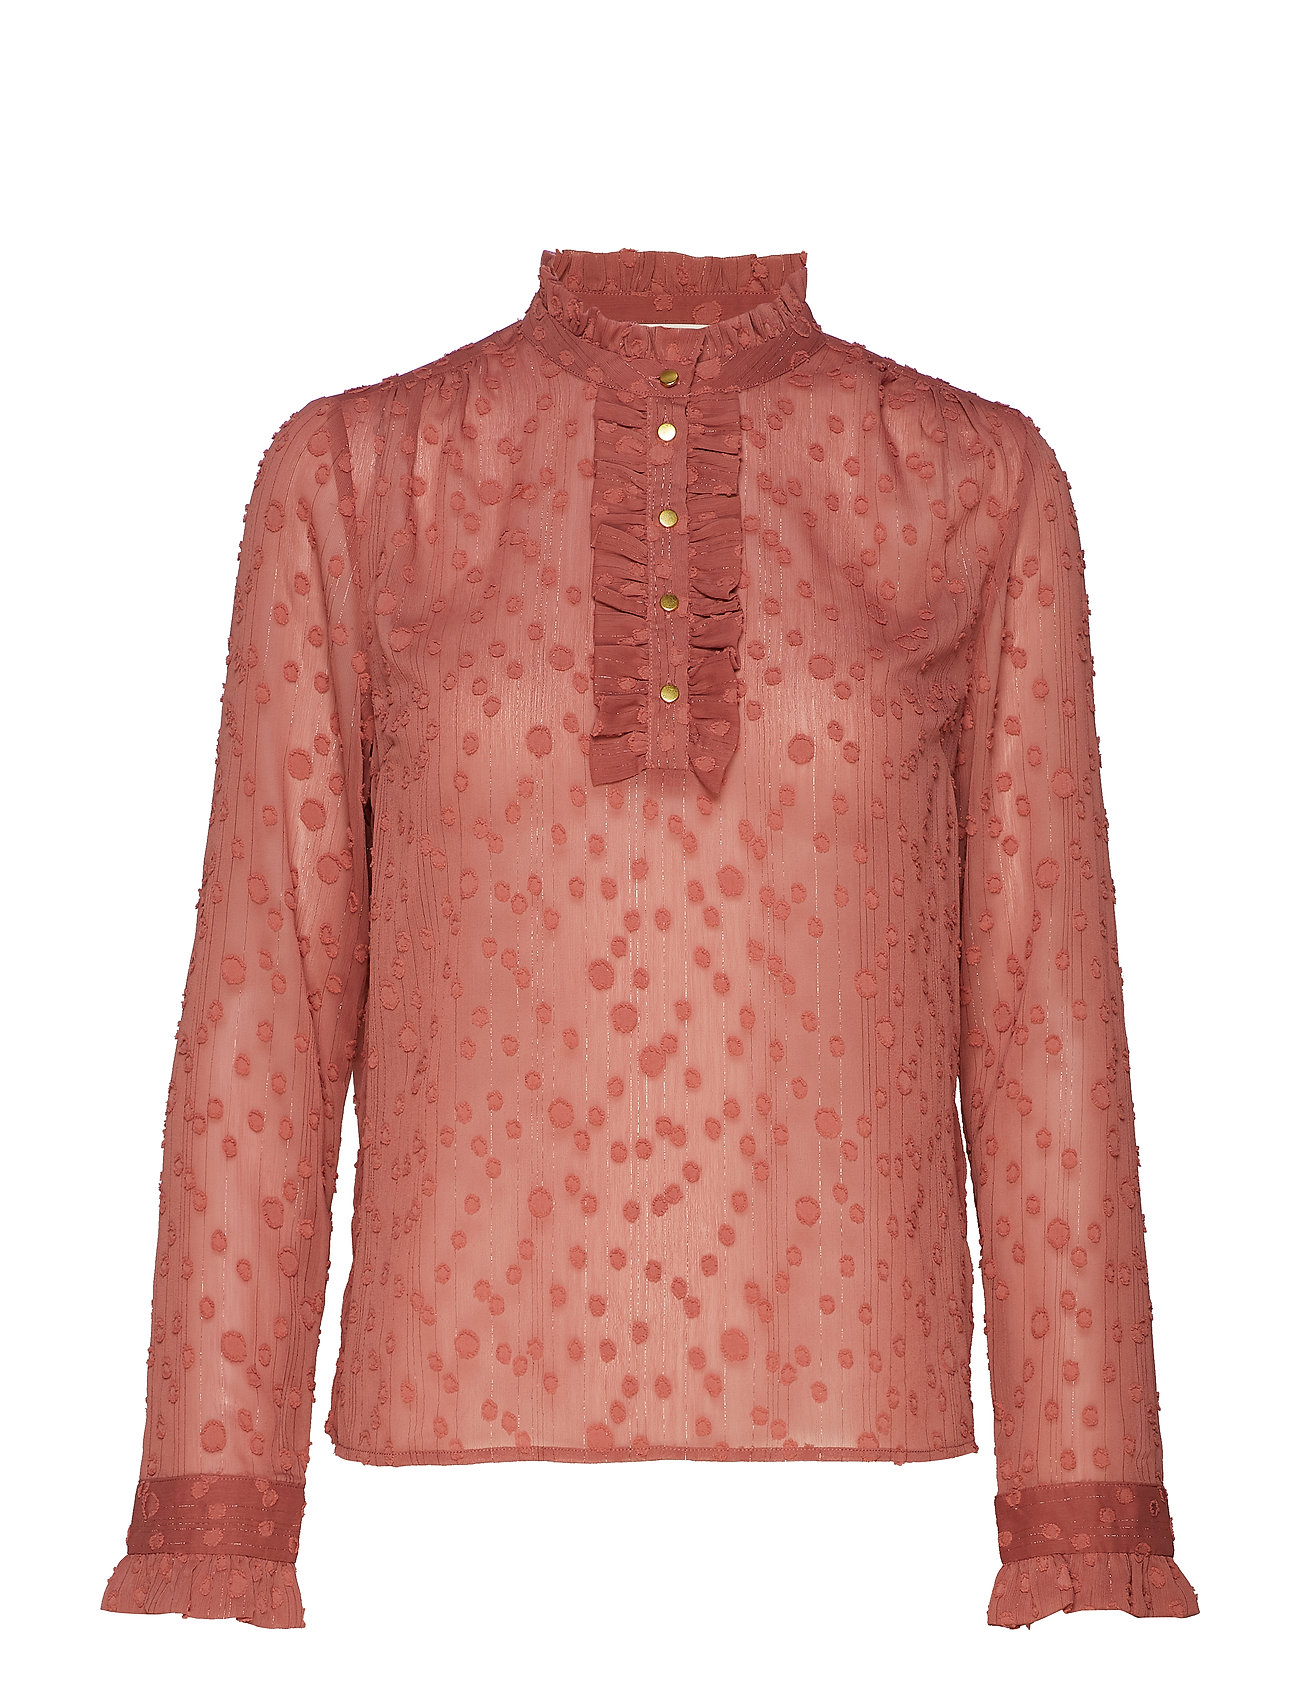 Sofie Schnoor Shirt - PEARL ROSE